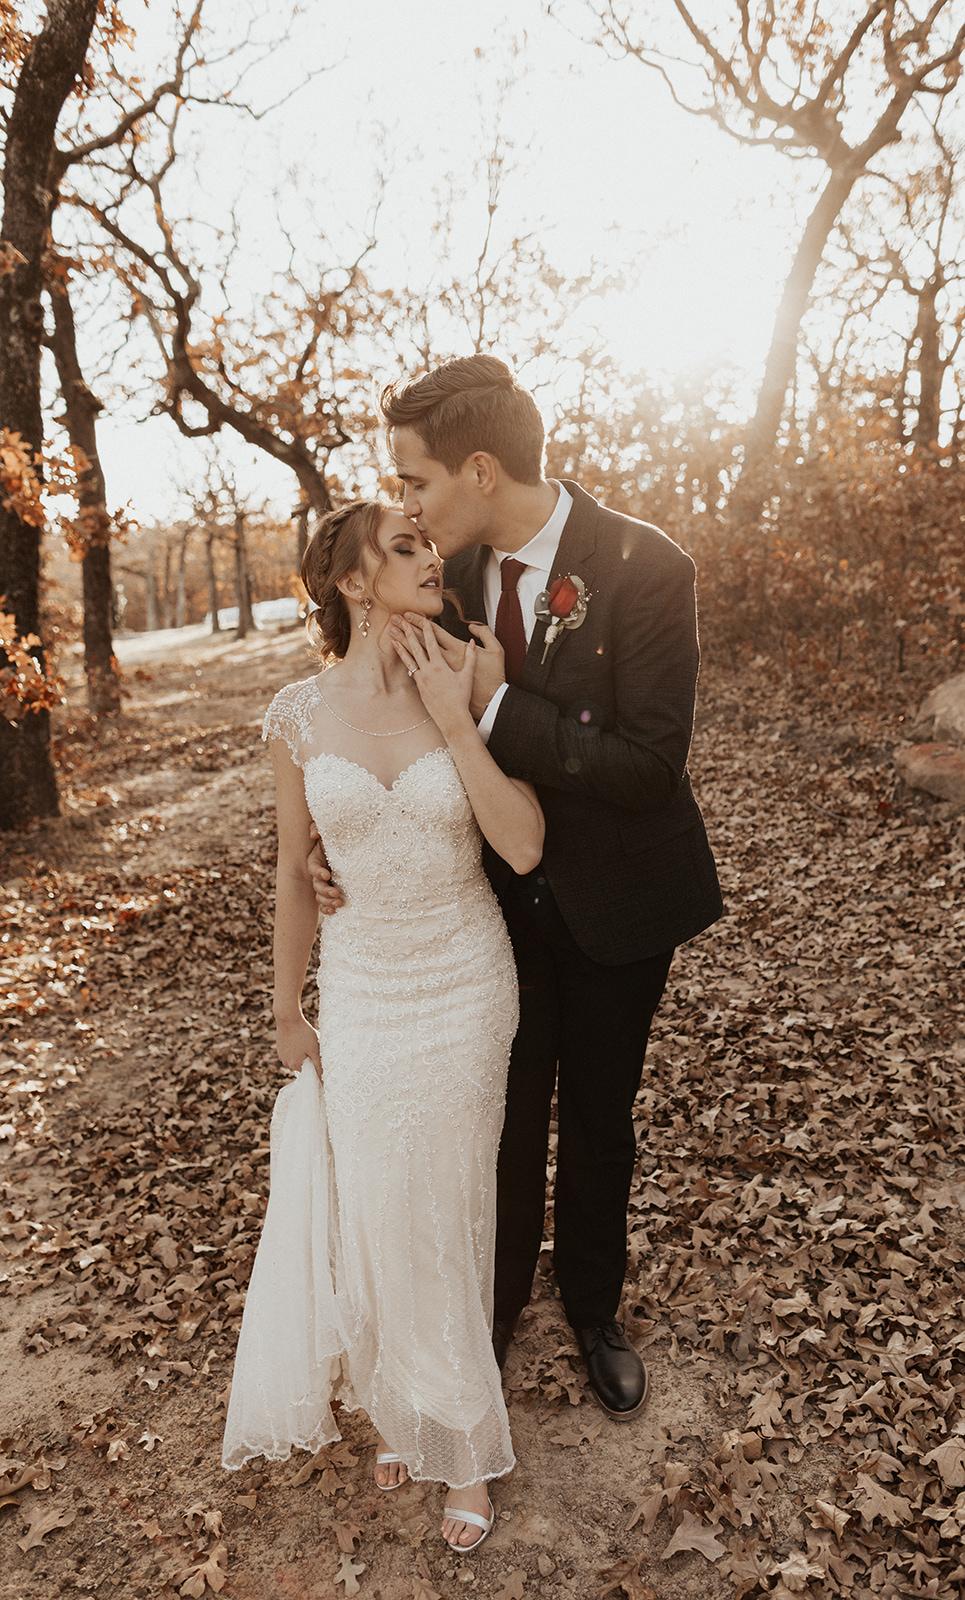 Best Wedding Venue in Tulsa Bixby Dream Point Ranch 21.jpg